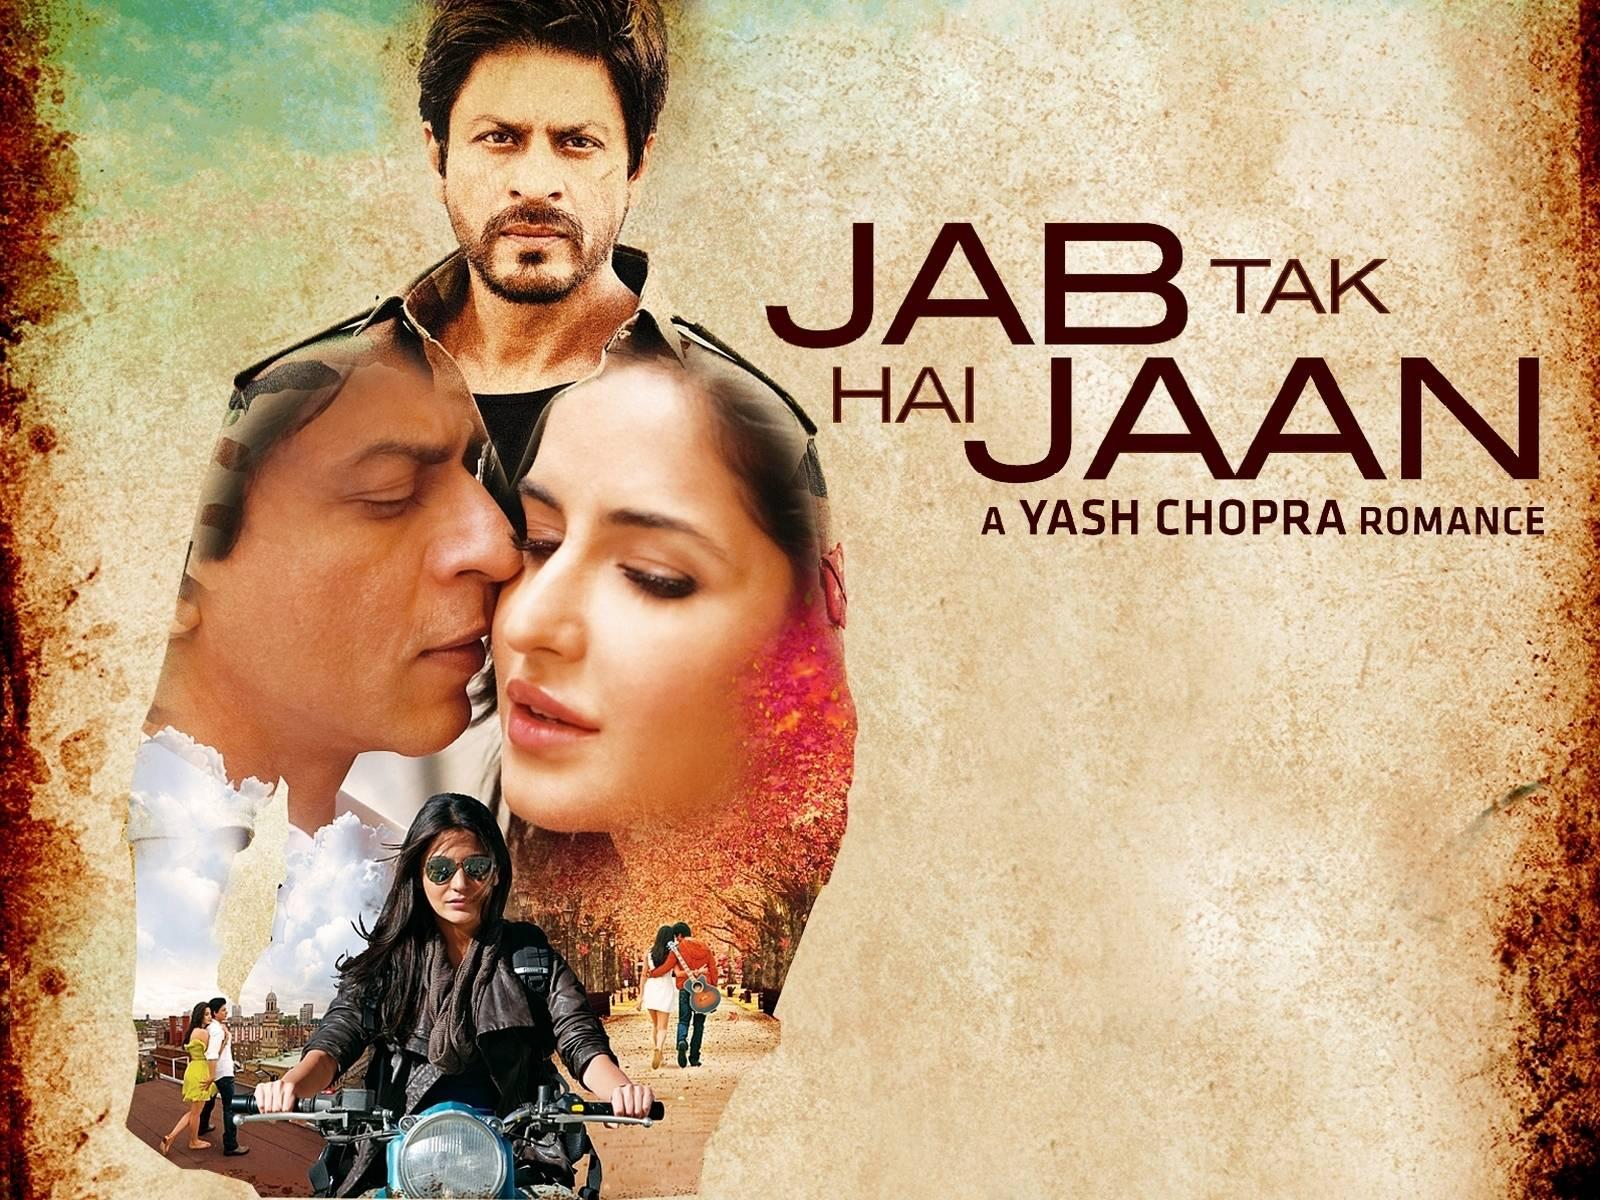 Jab-Tak-Hai-Jaan-poster-photo